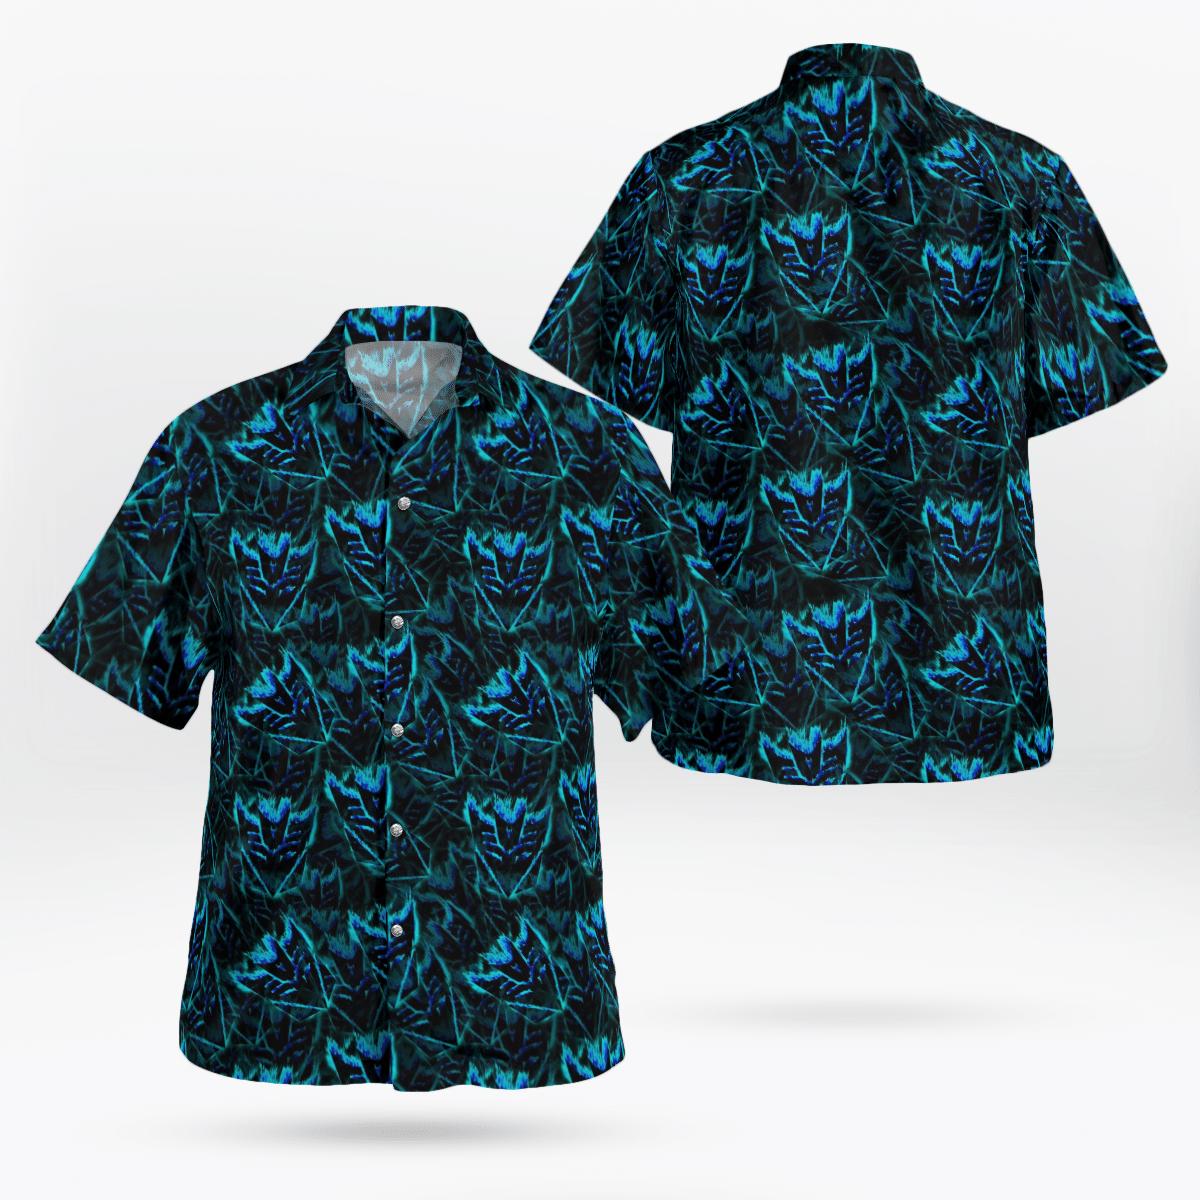 Decepticon Transformer 80s Hawaiian Shirt